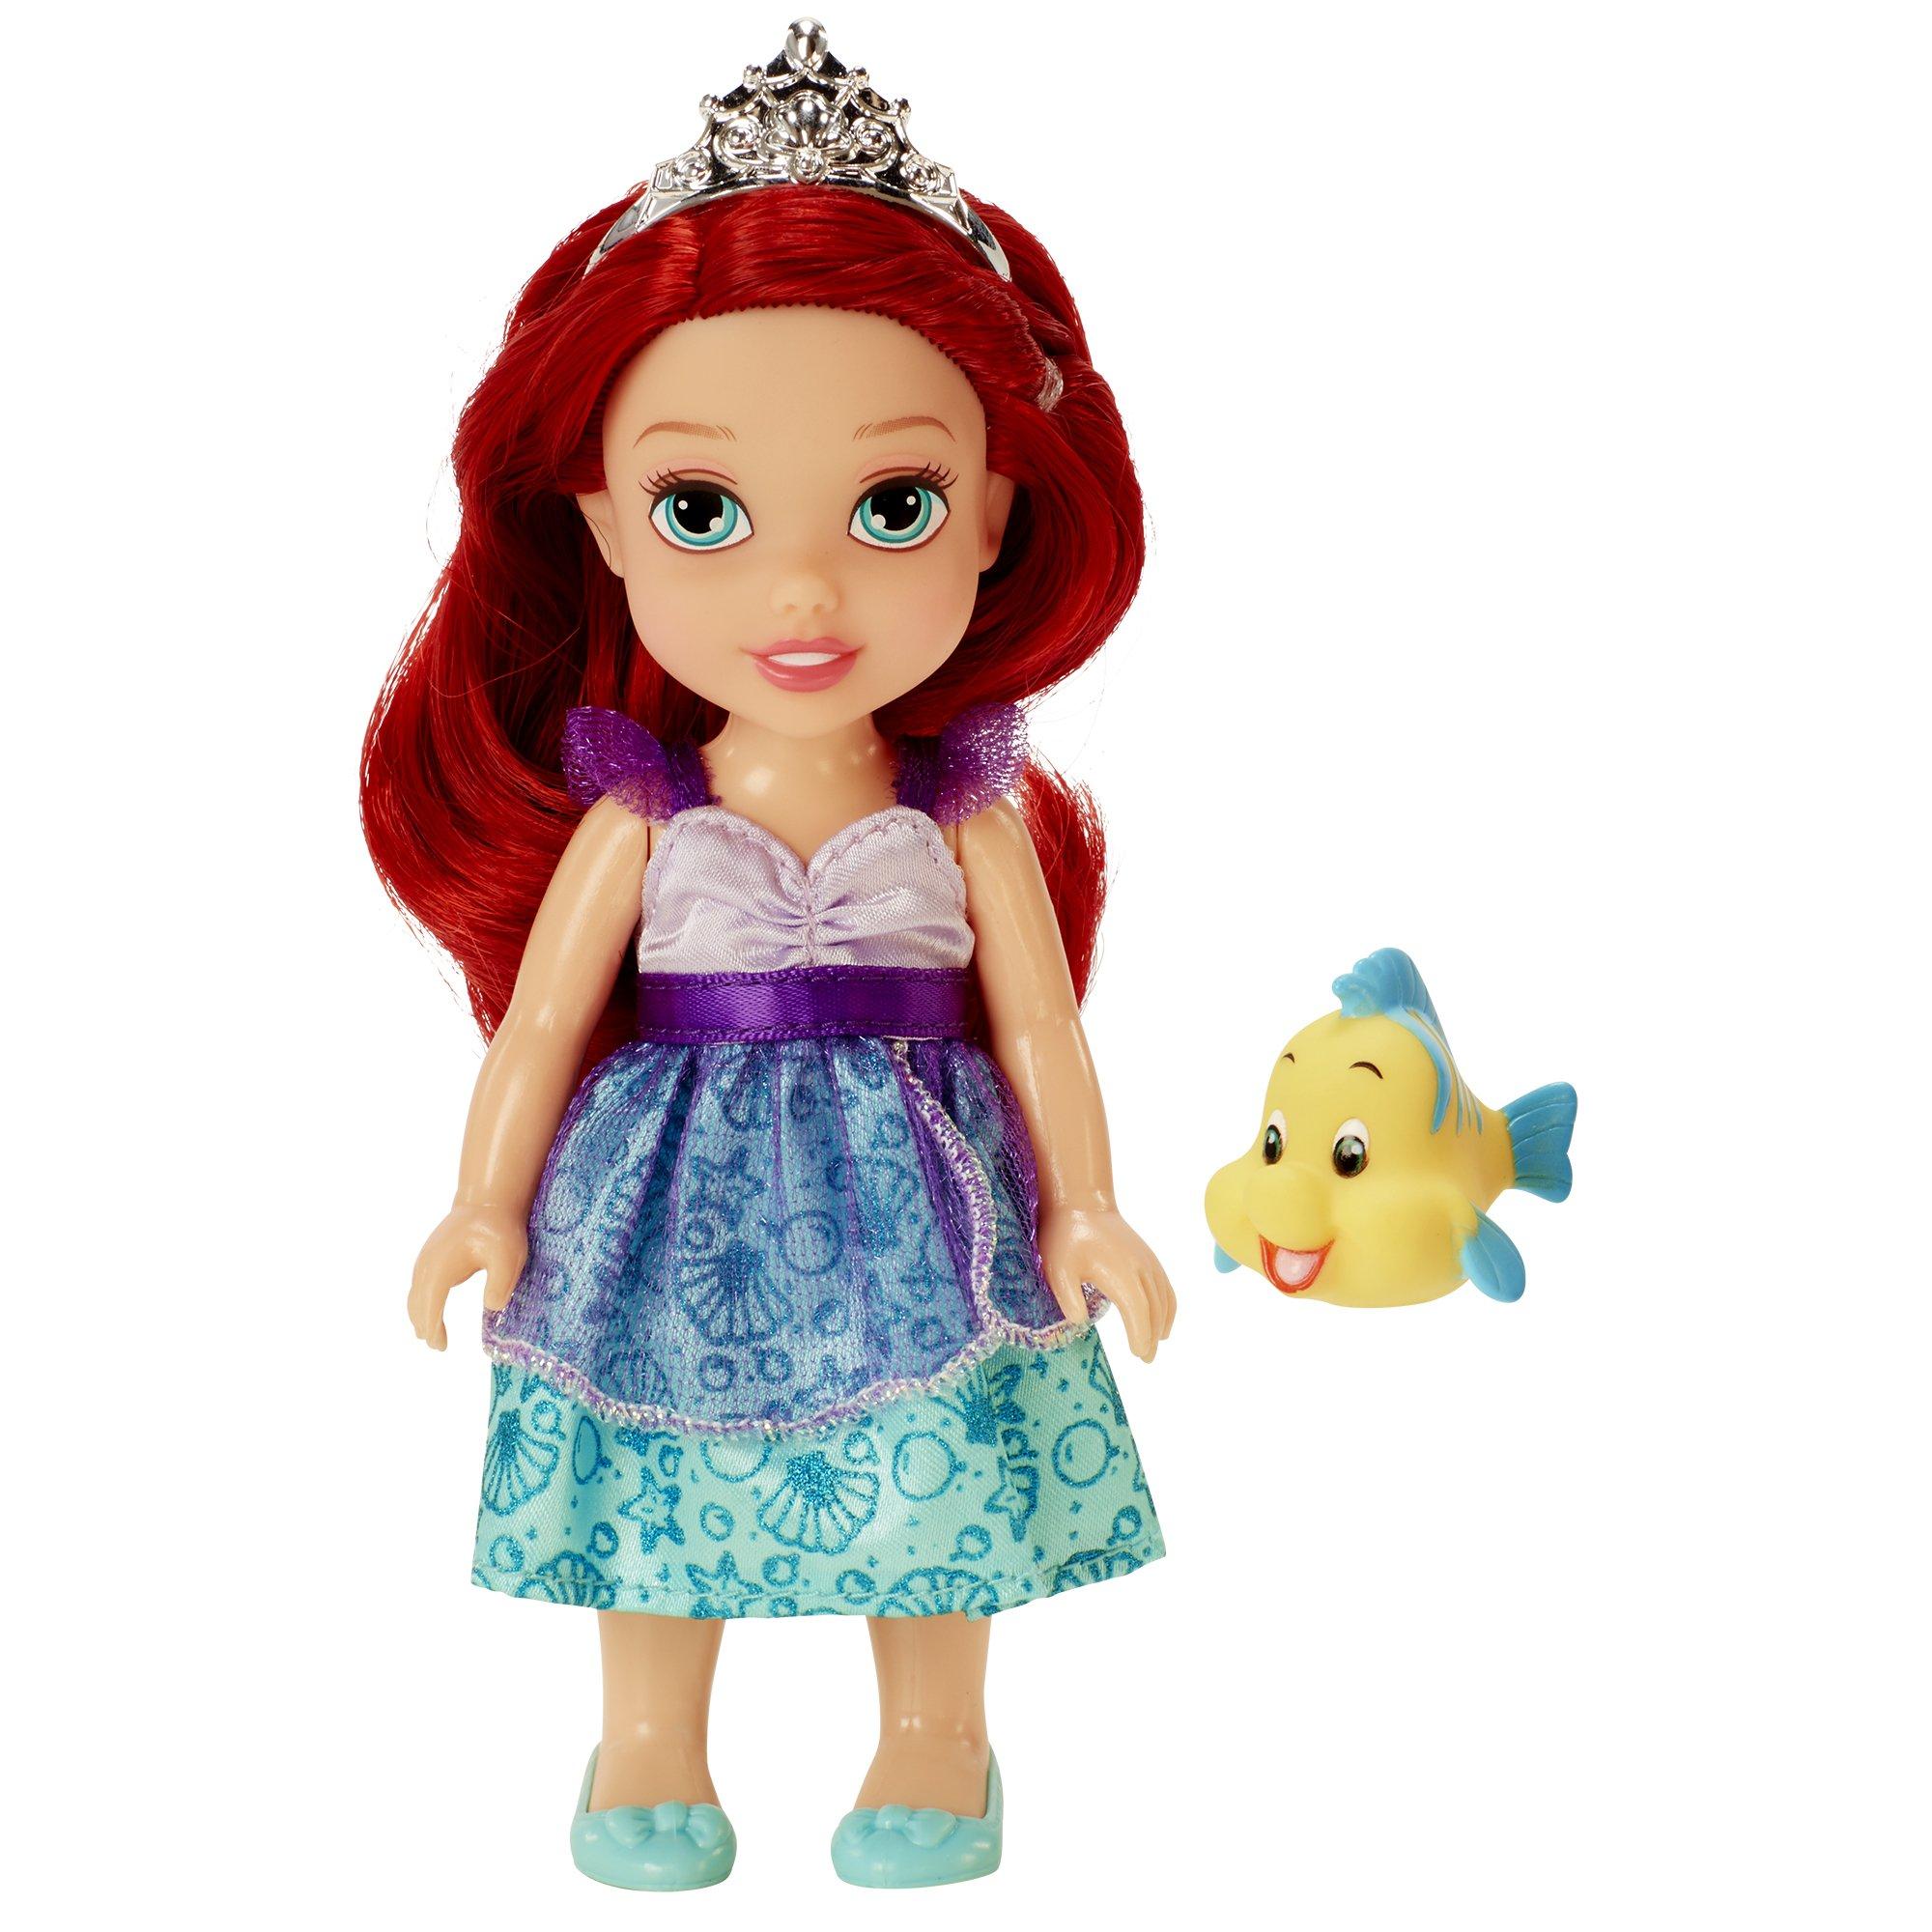 Amazon Com Disney Princess Baby Belle Doll Toys Games: Amazon.com: Disney Princess Petite Mulan Doll And Pony